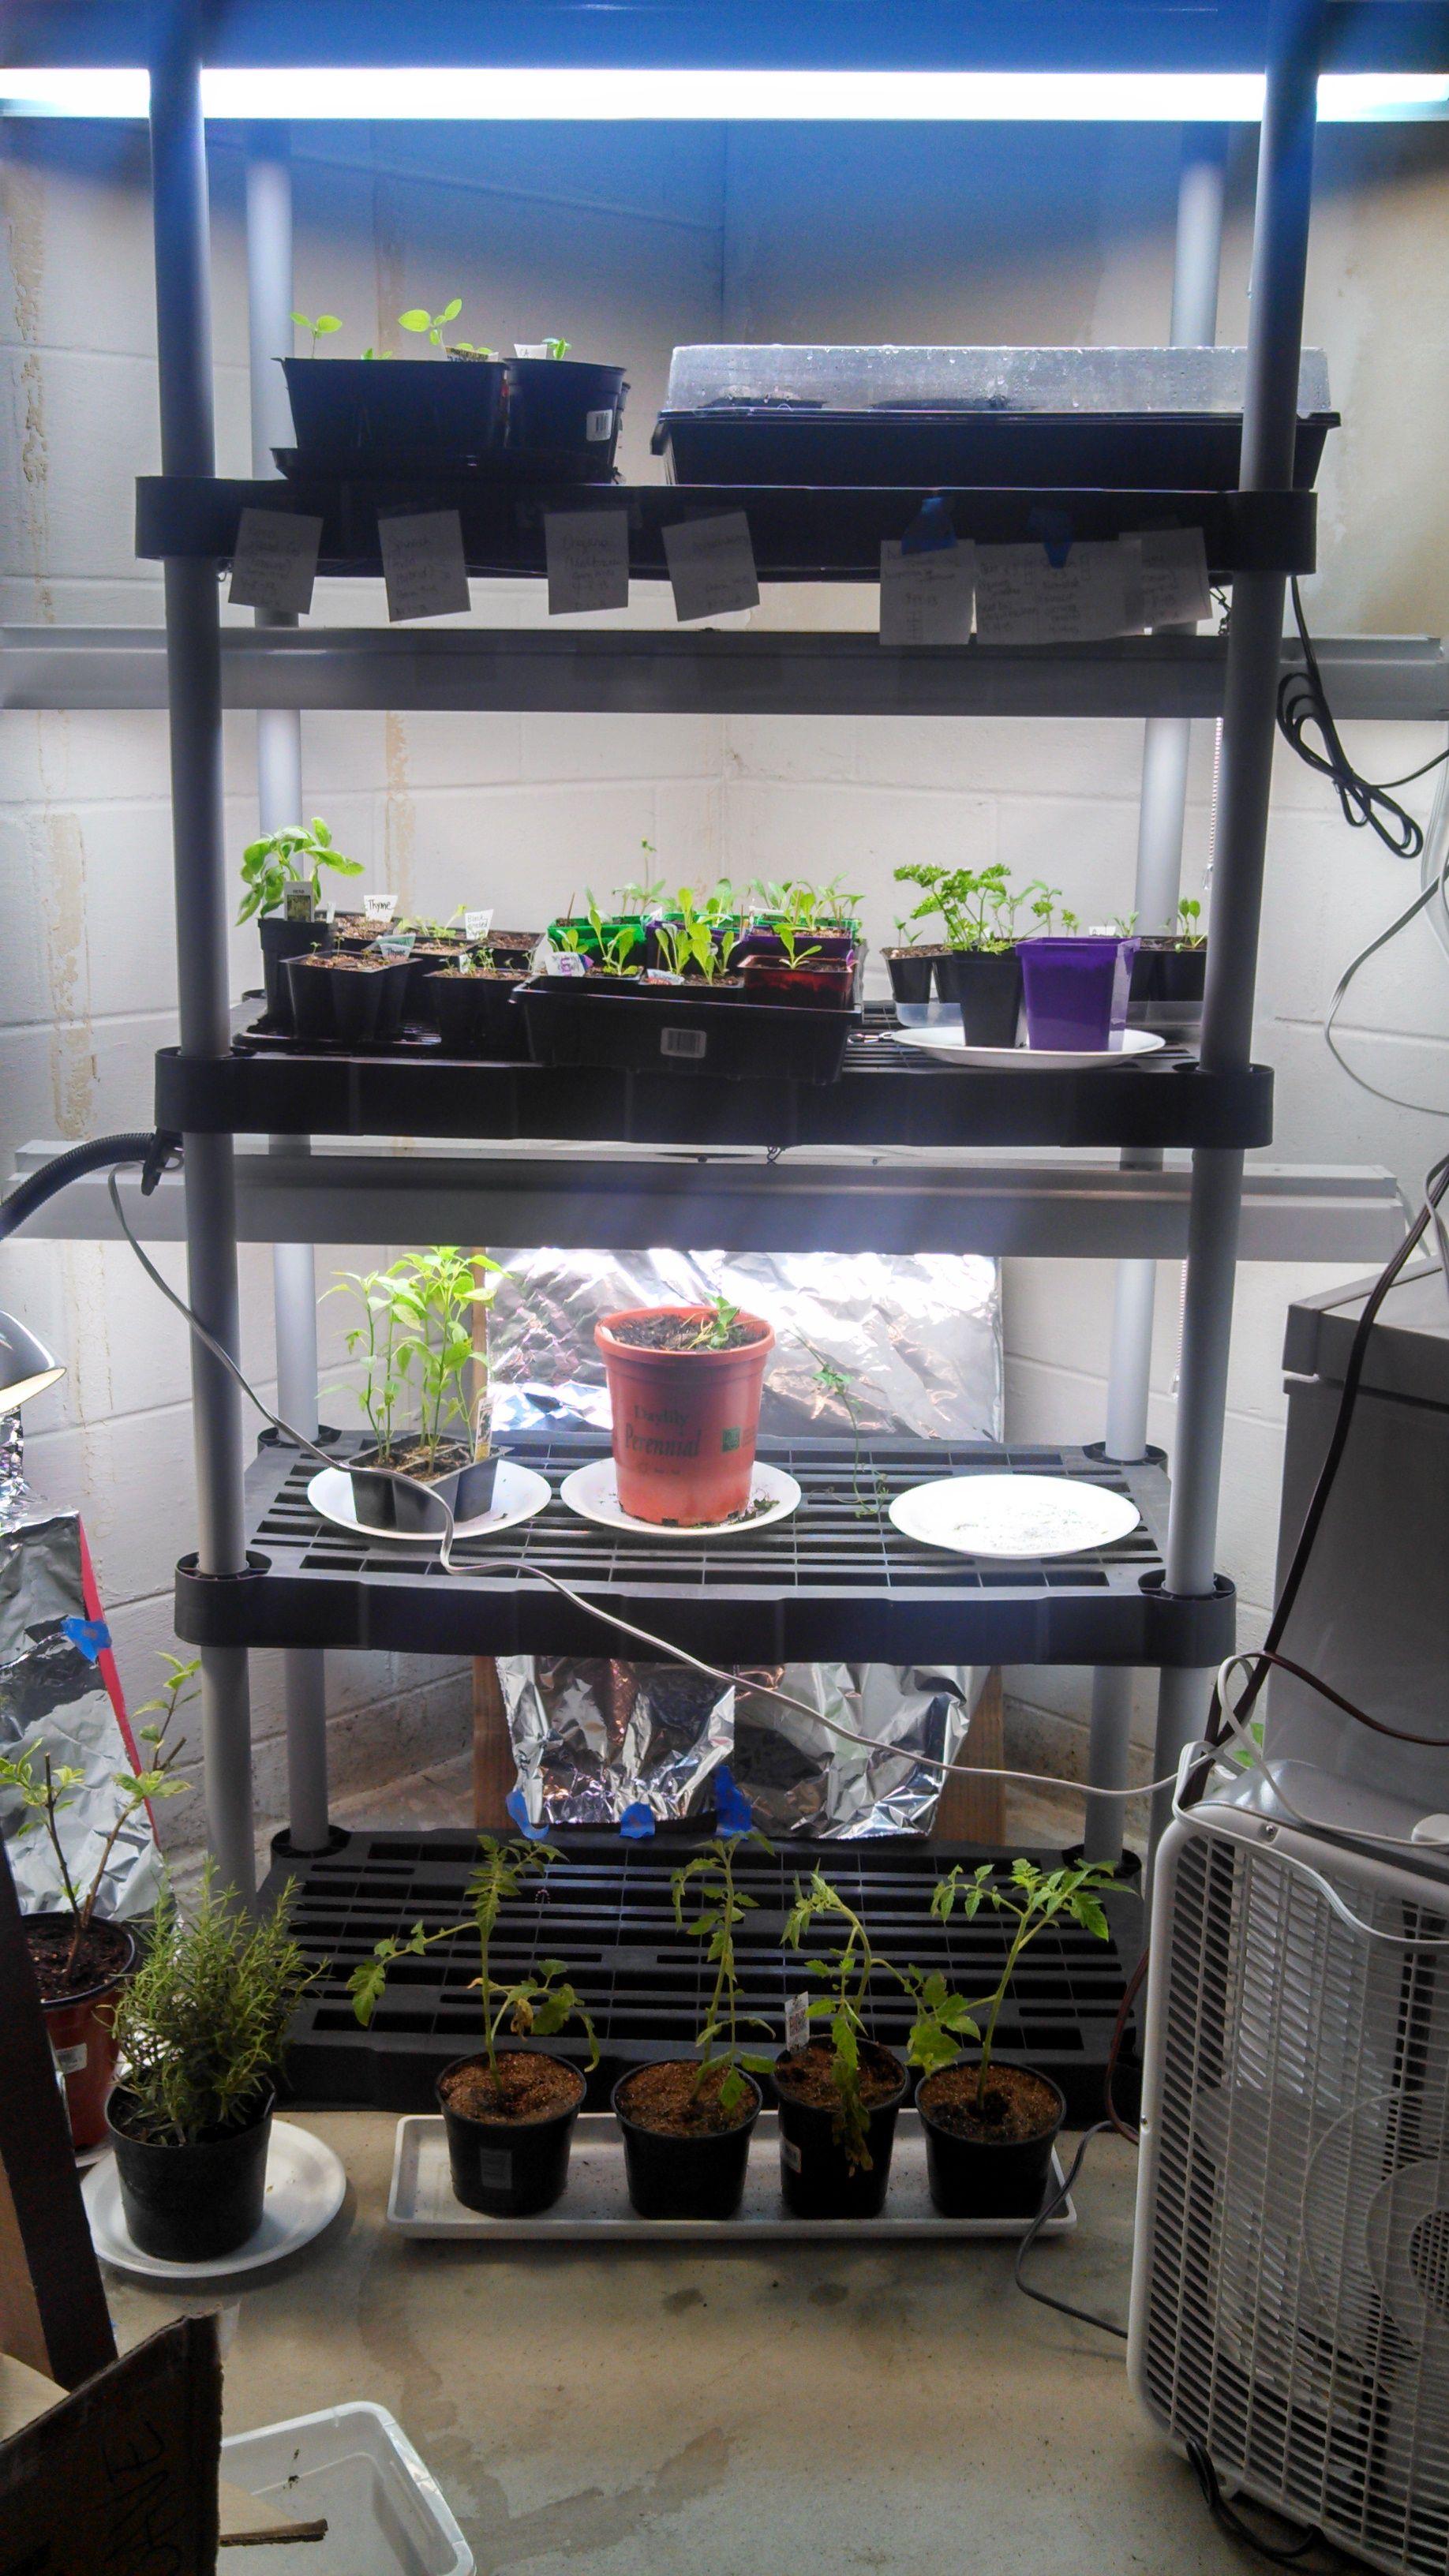 My Basement Grow Light Set Up Plastic Shelving With Fluorescent